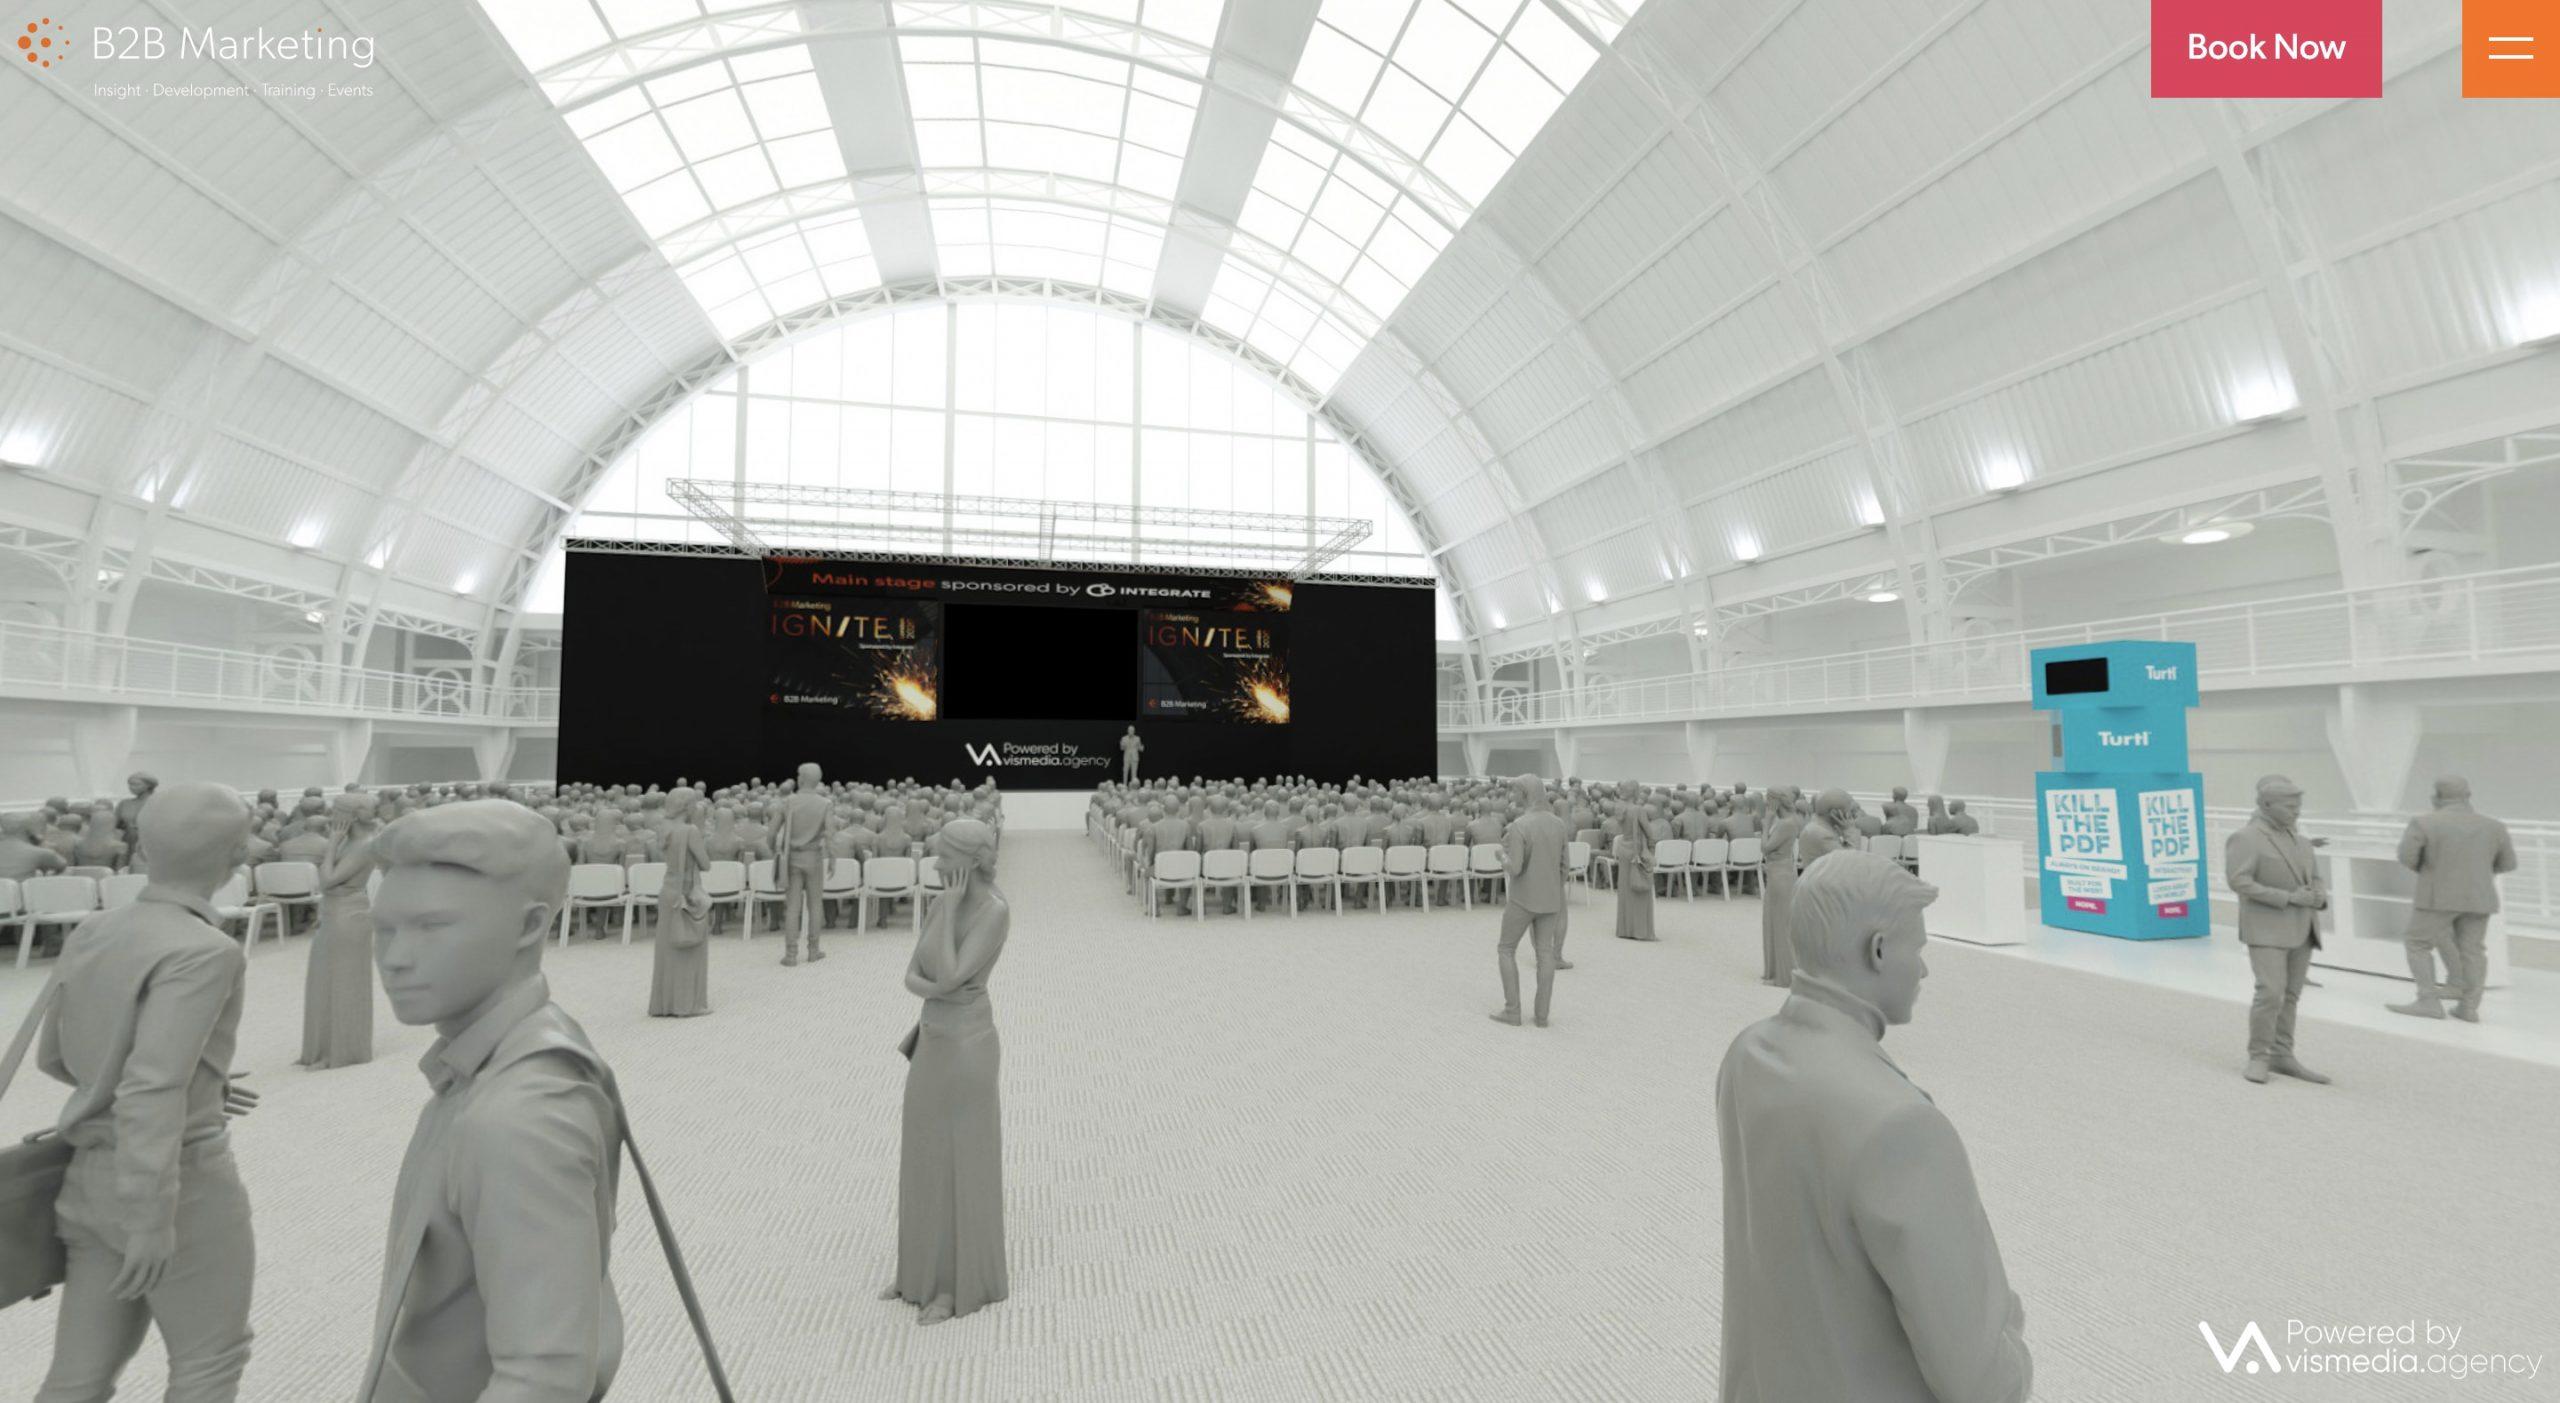 Ignite London interactive content marketing experience